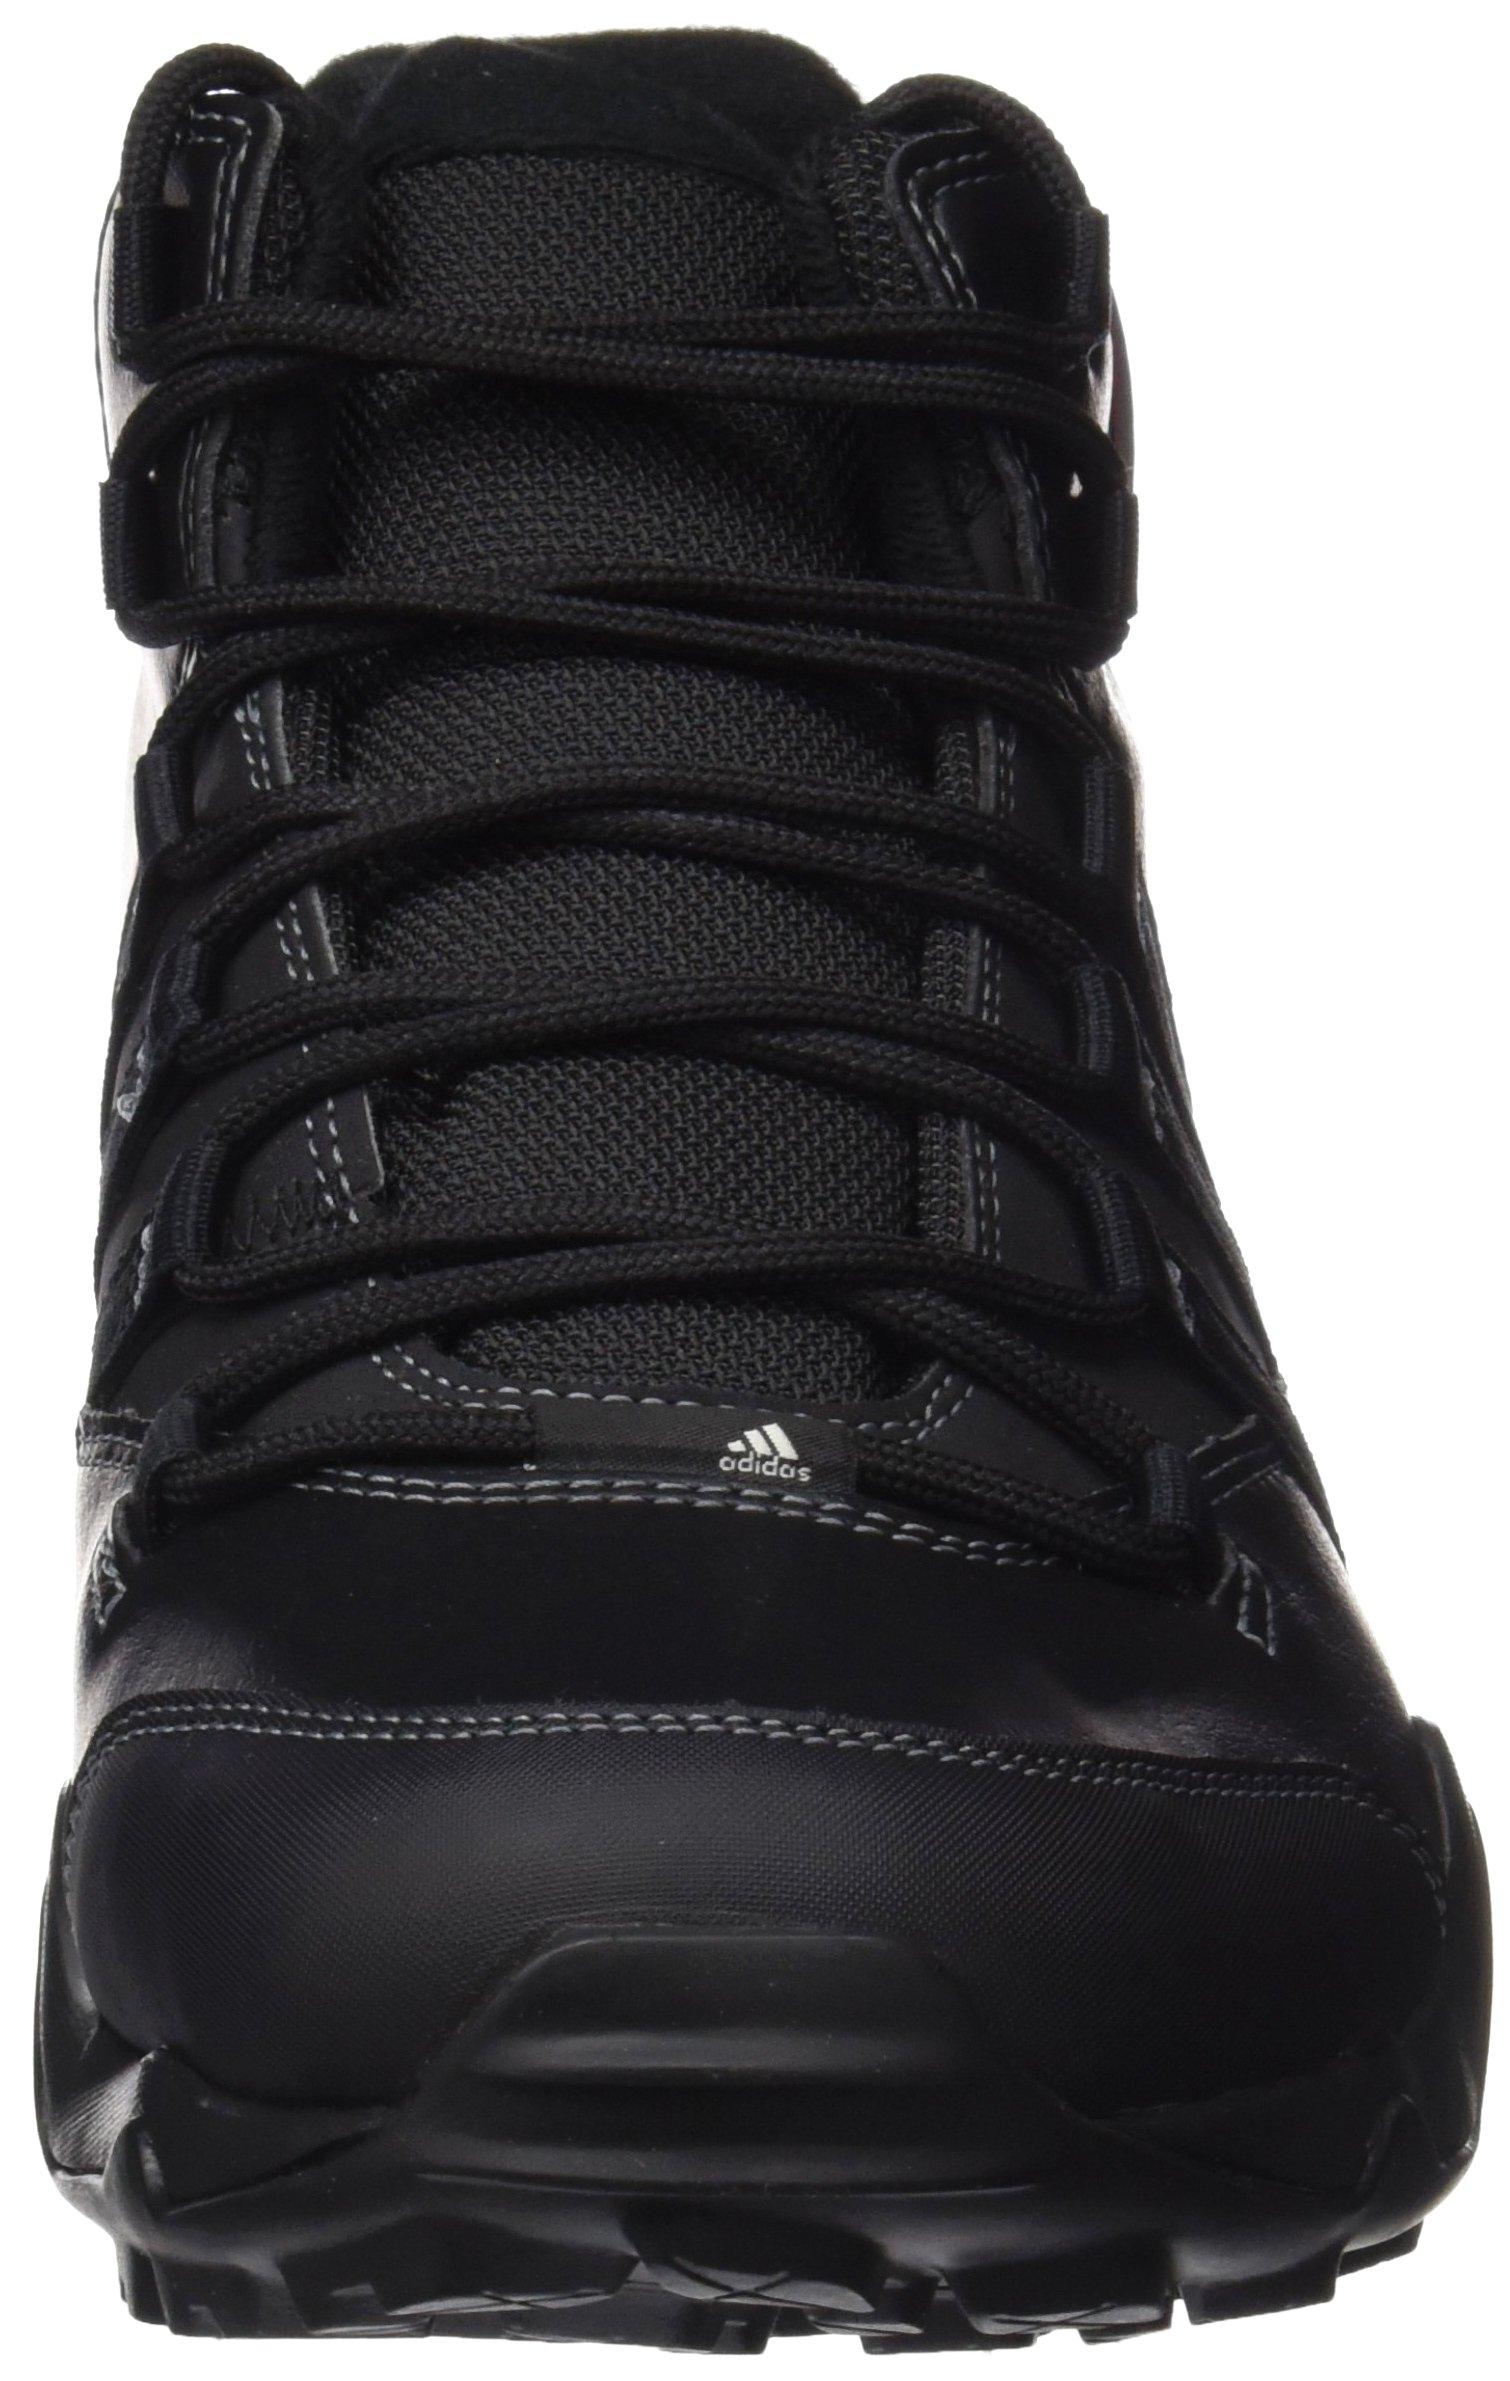 81hhS3DQ21L - adidas Men's Terrex Ax2r Beta Mid Cw High Rise Hiking Boots